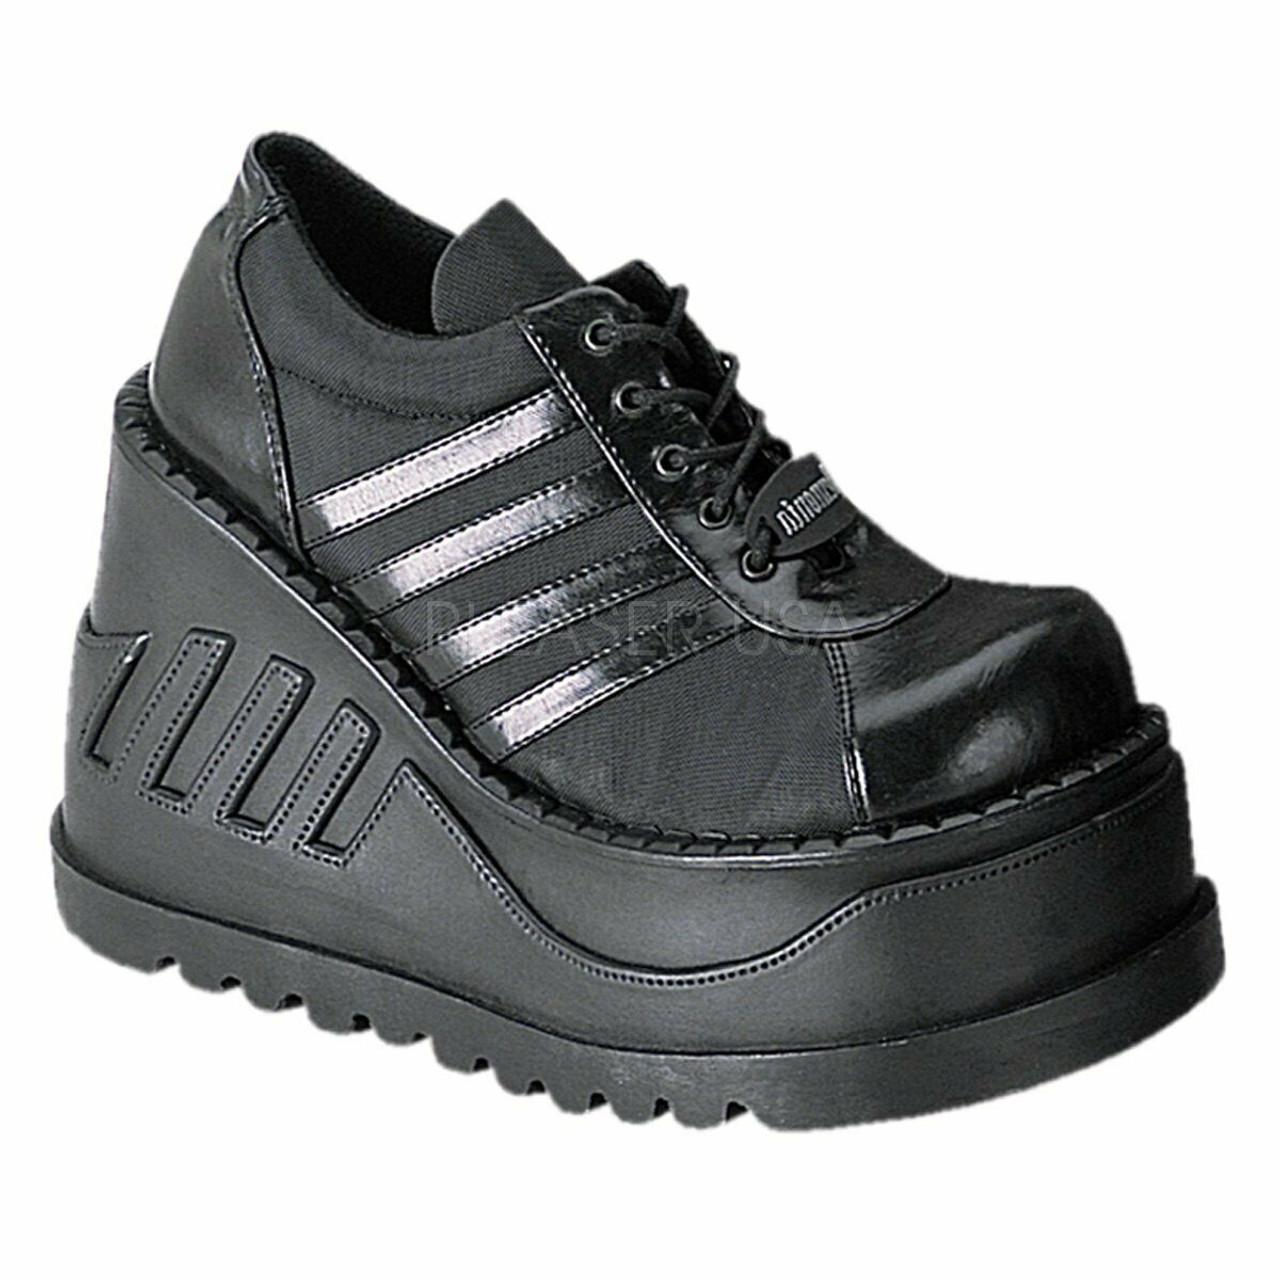 2439115d79e Demonia Cyber Gothic Punk Alternative Black Platforms Sneakers Shoes  Stomp-08